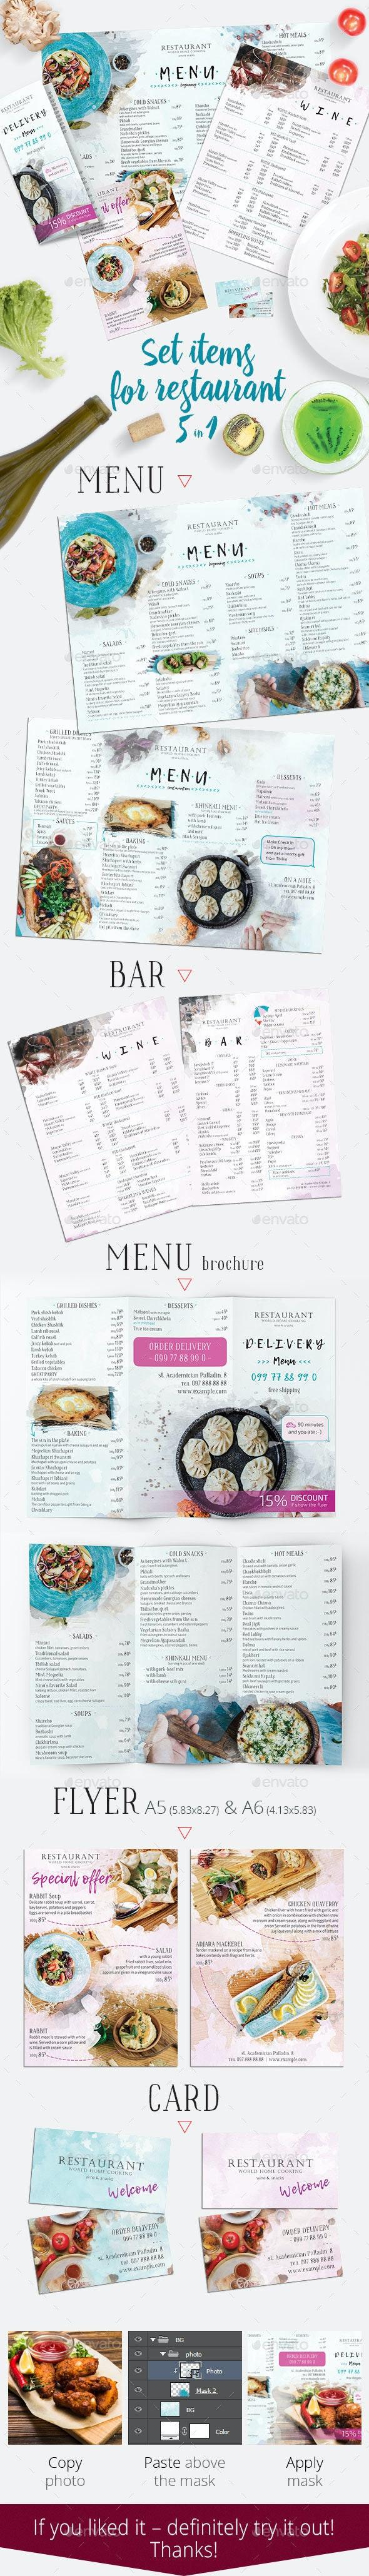 Set Items for Restaurant 5 in 1 - Food Menus Print Templates